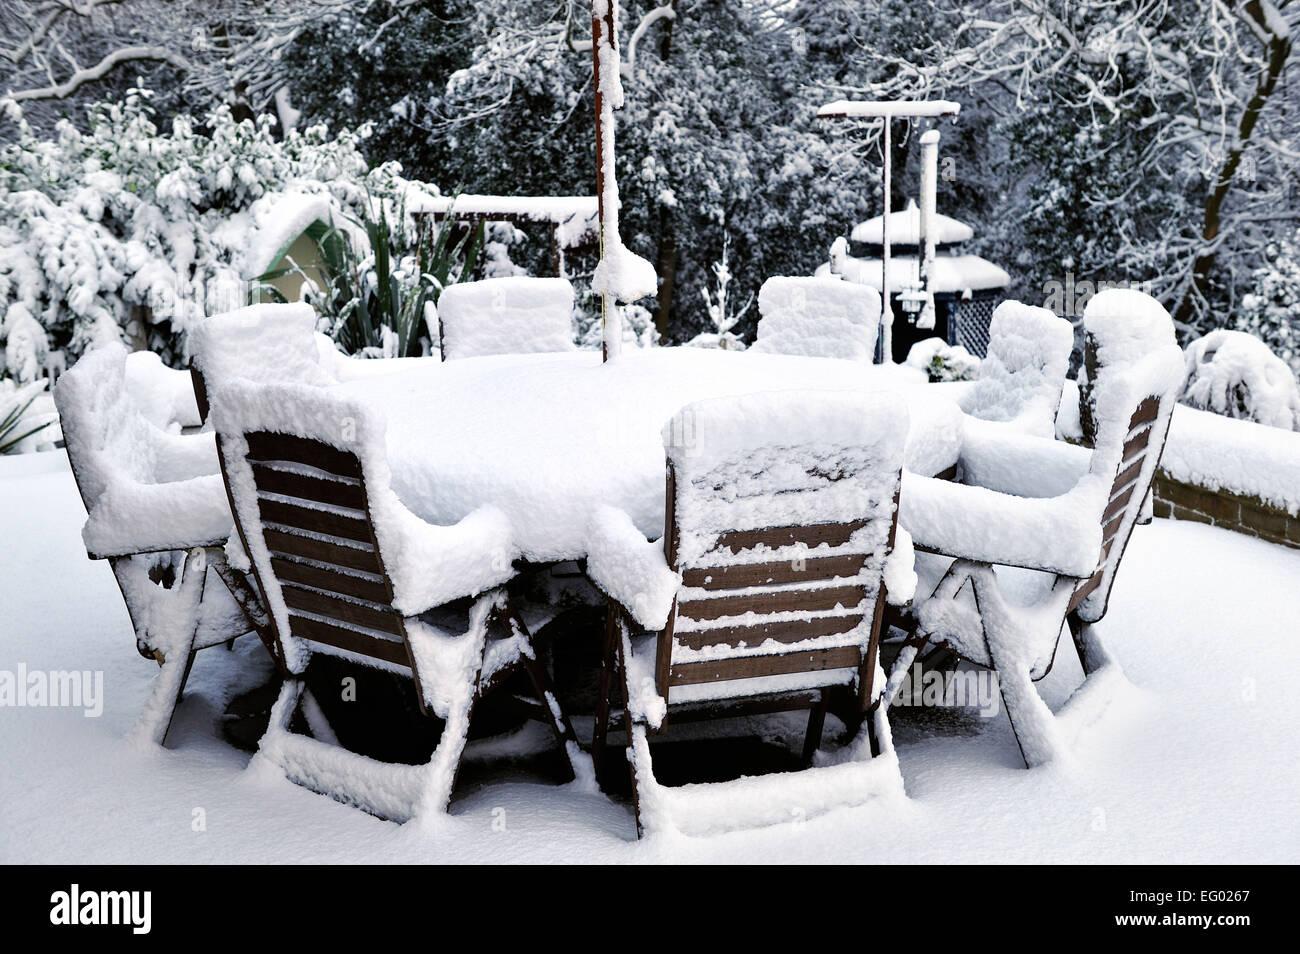 Coperta di neve mobili da giardino in Inghilterra Immagini Stock